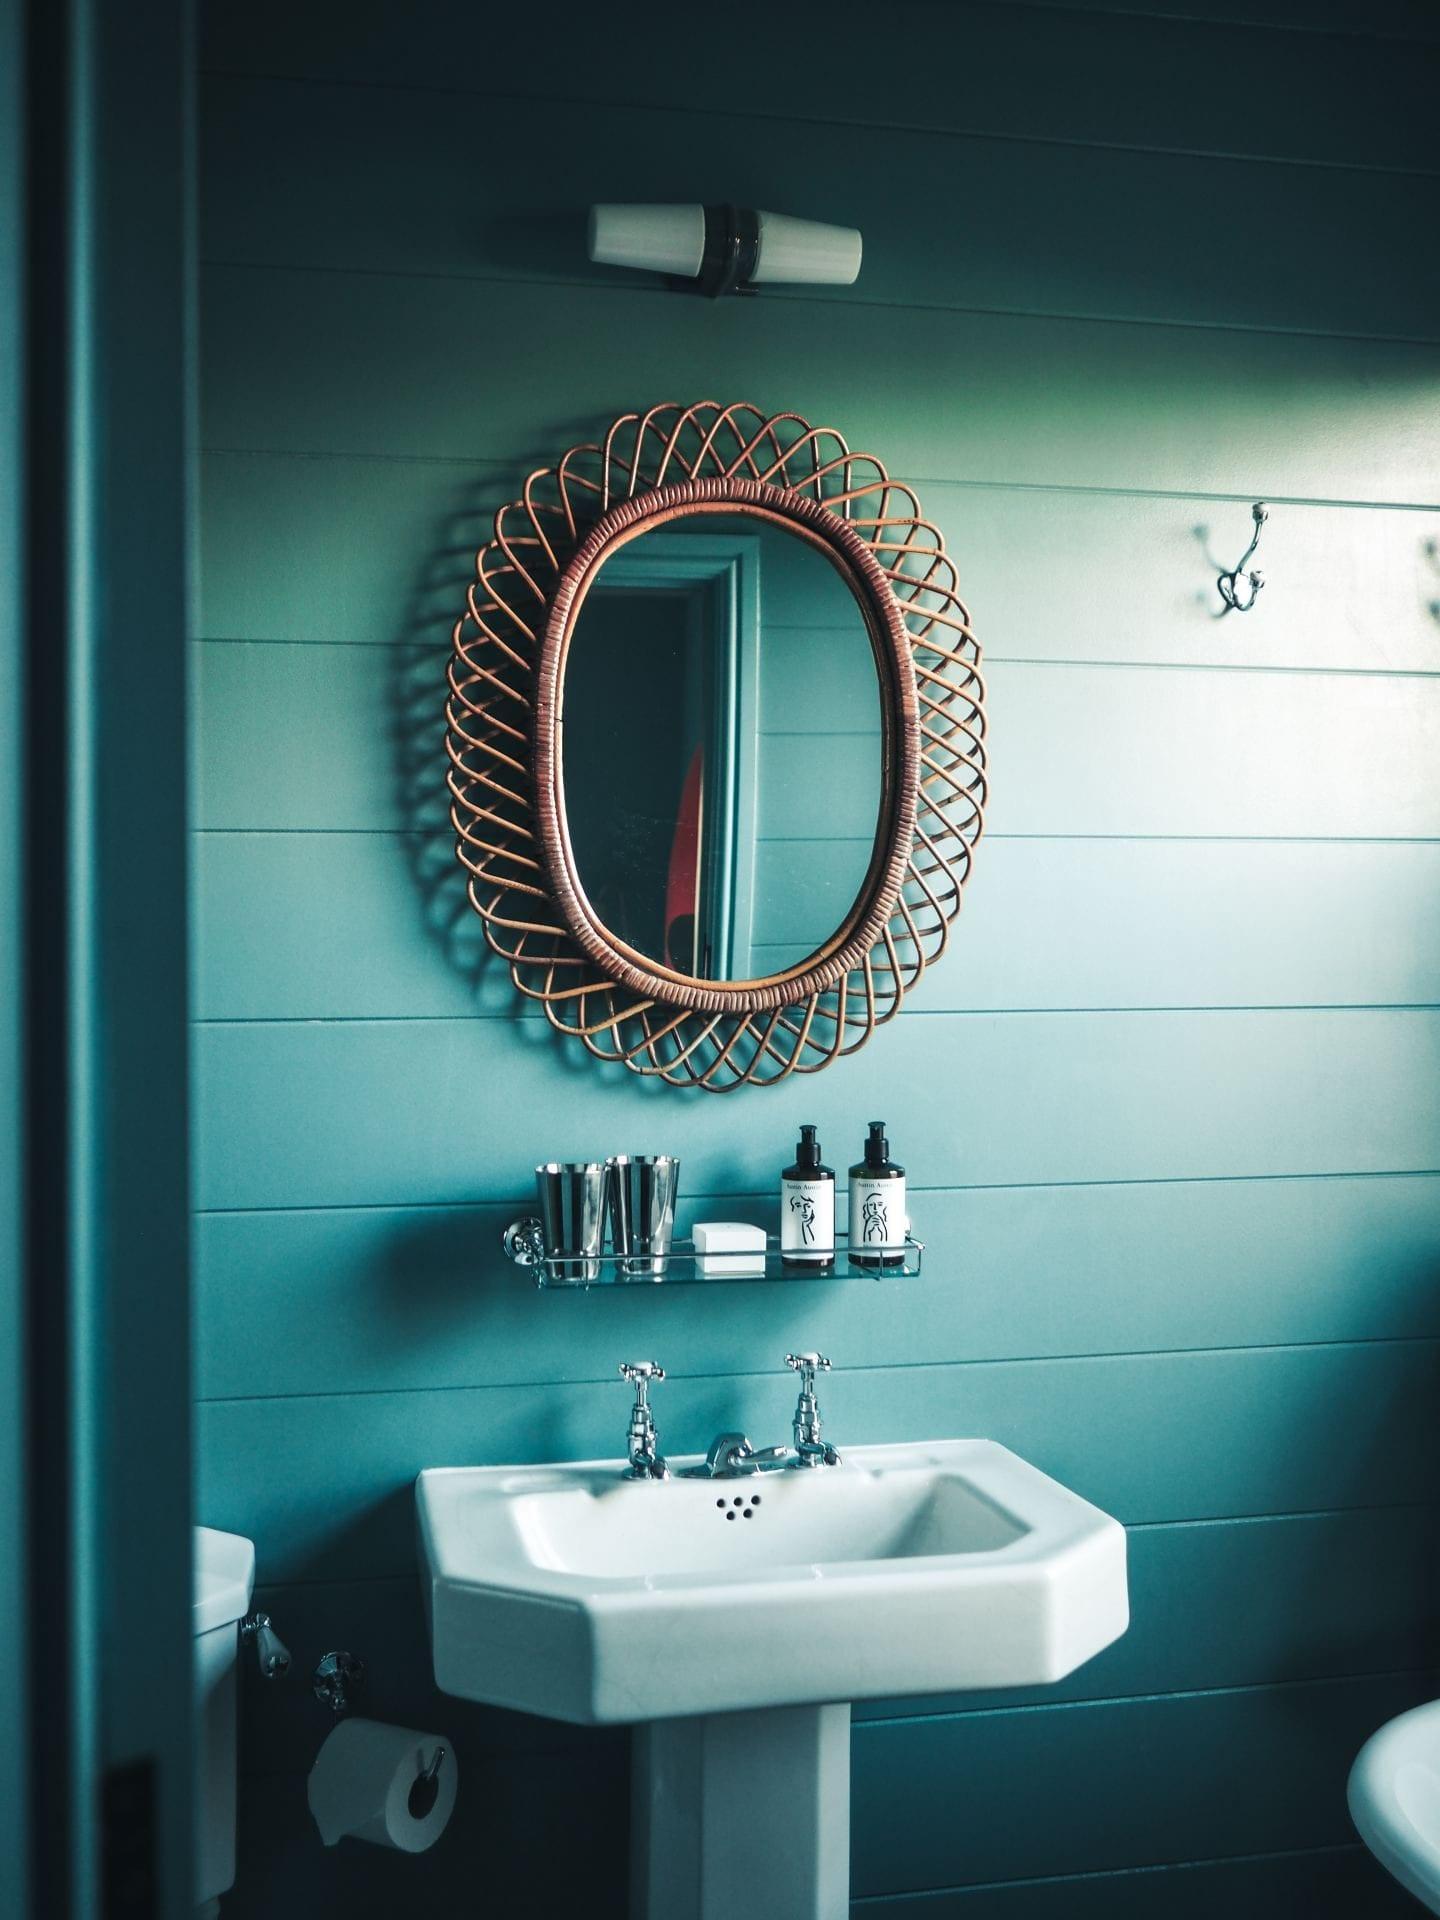 the rose deal kent decor interior design bamboo bathroom mirror green bathroom vintage